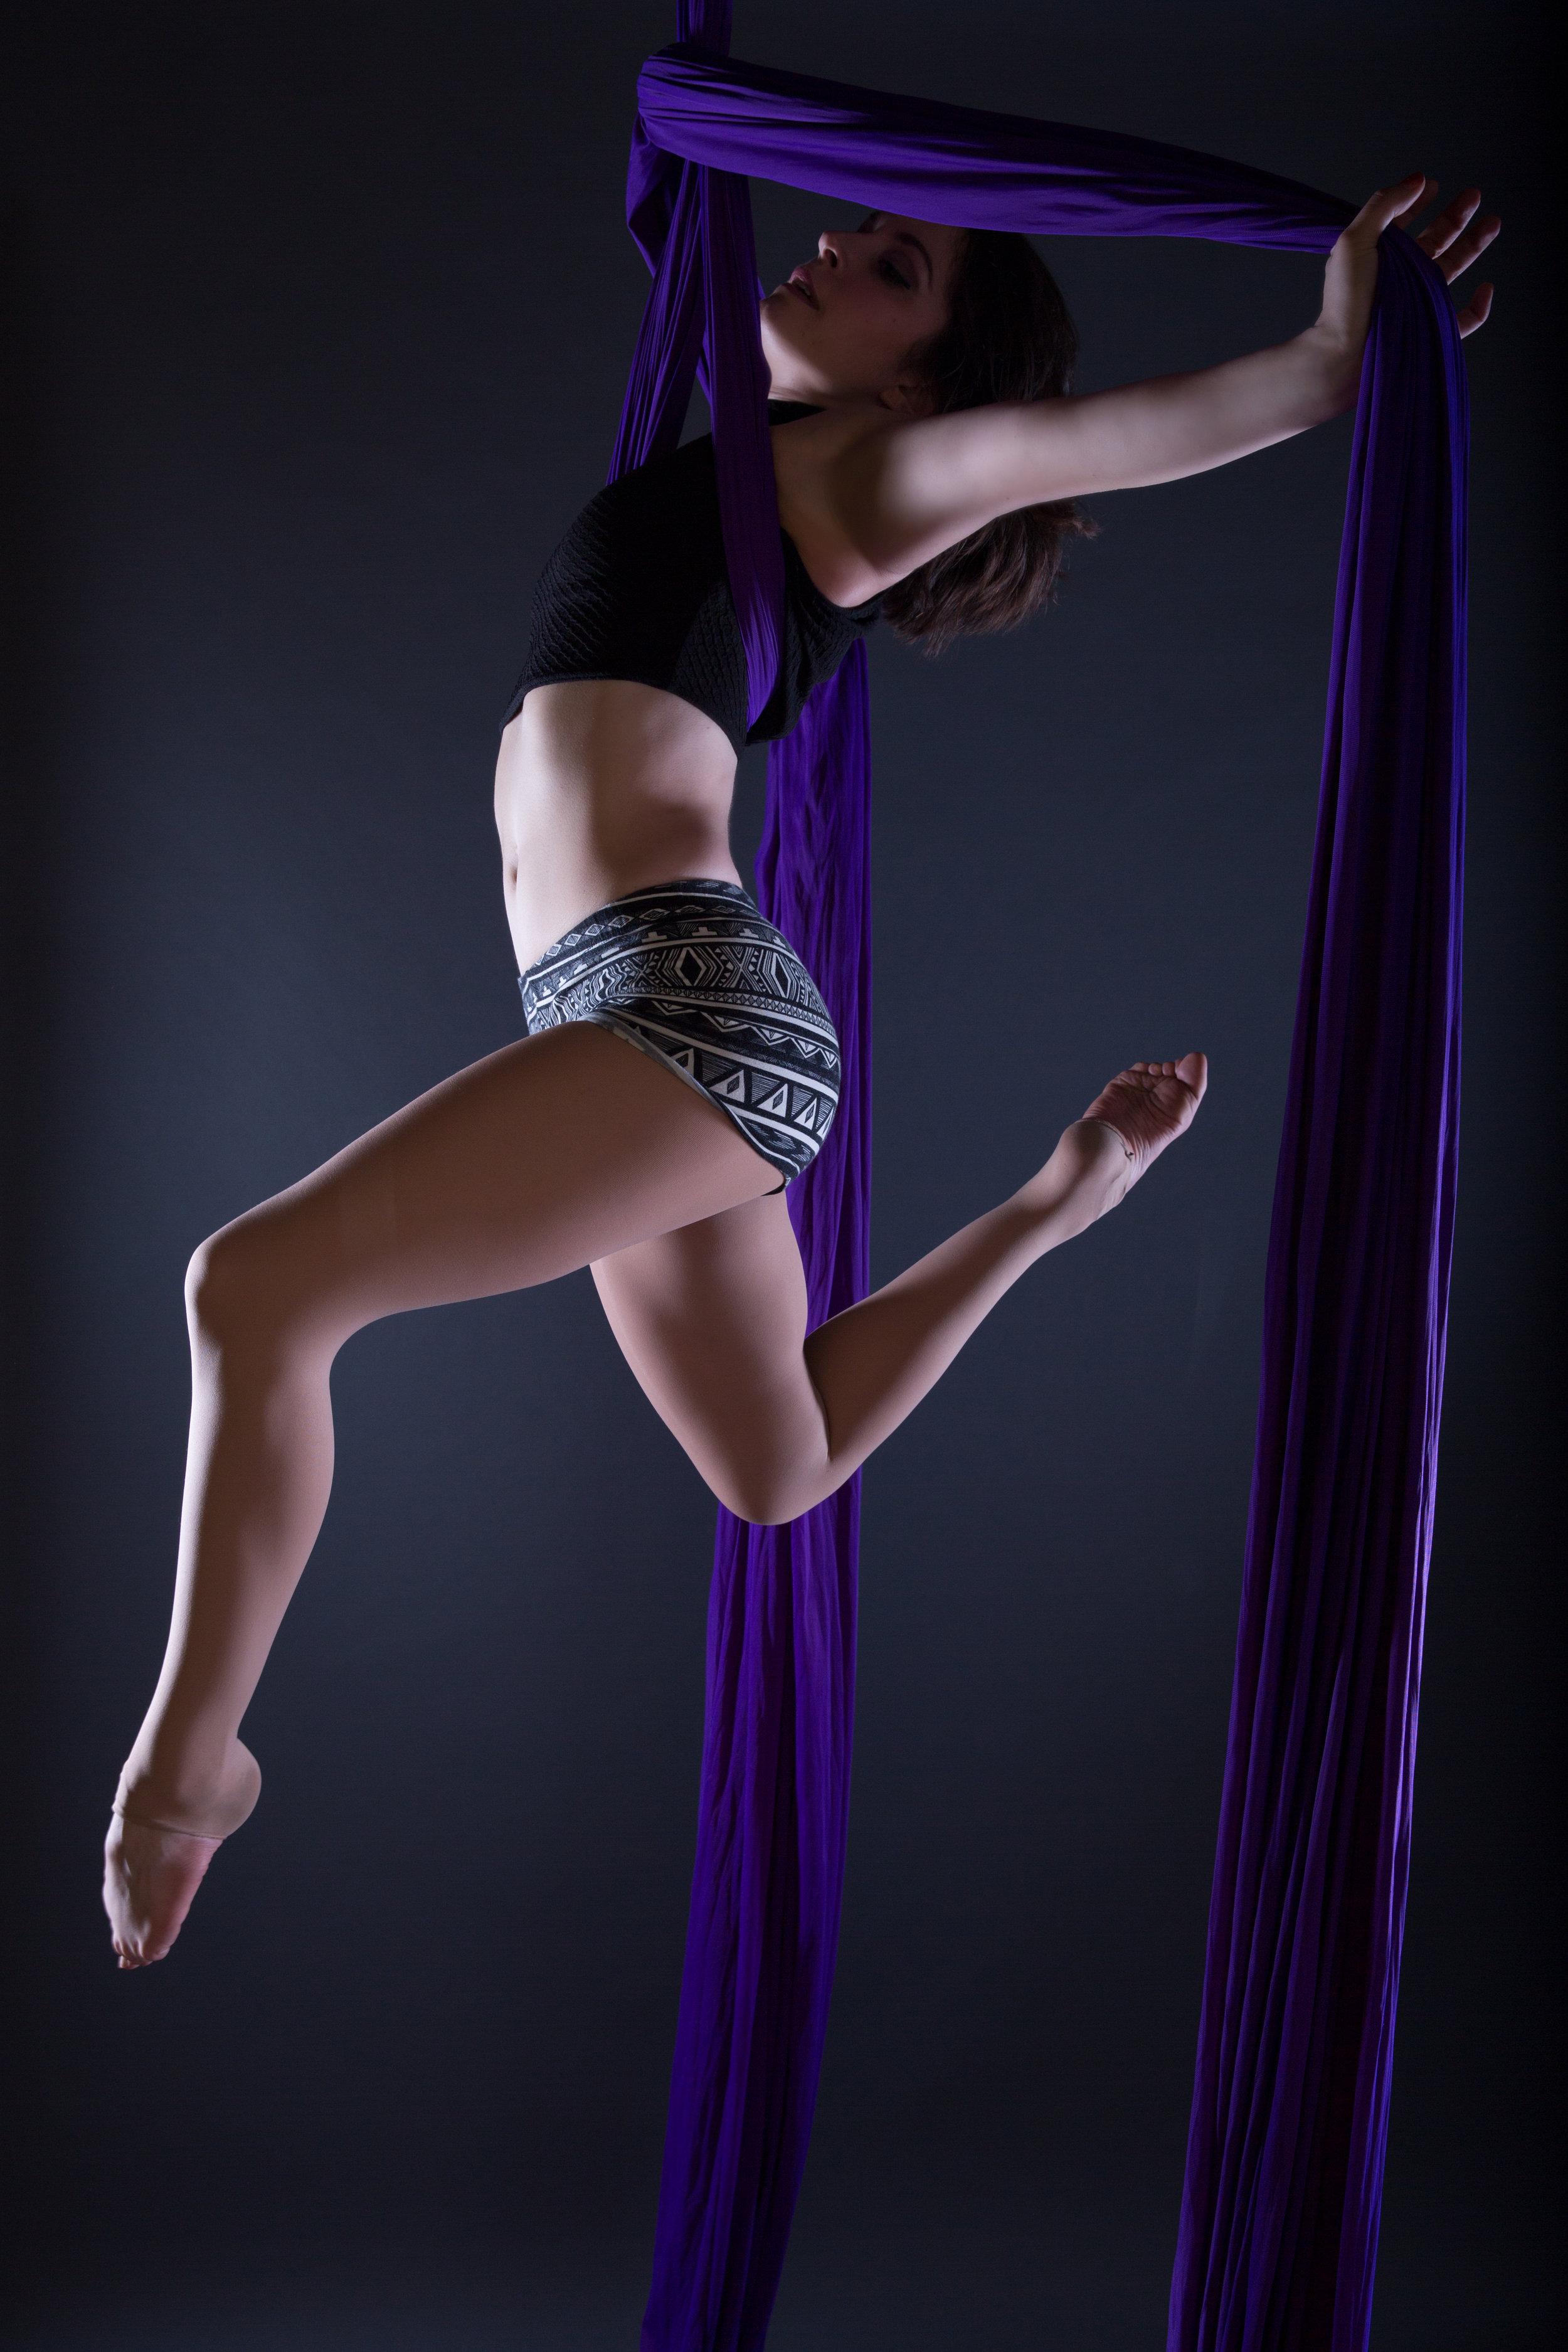 Elle Aime Photography by Leah Marie - Kristen Krump-2.jpg